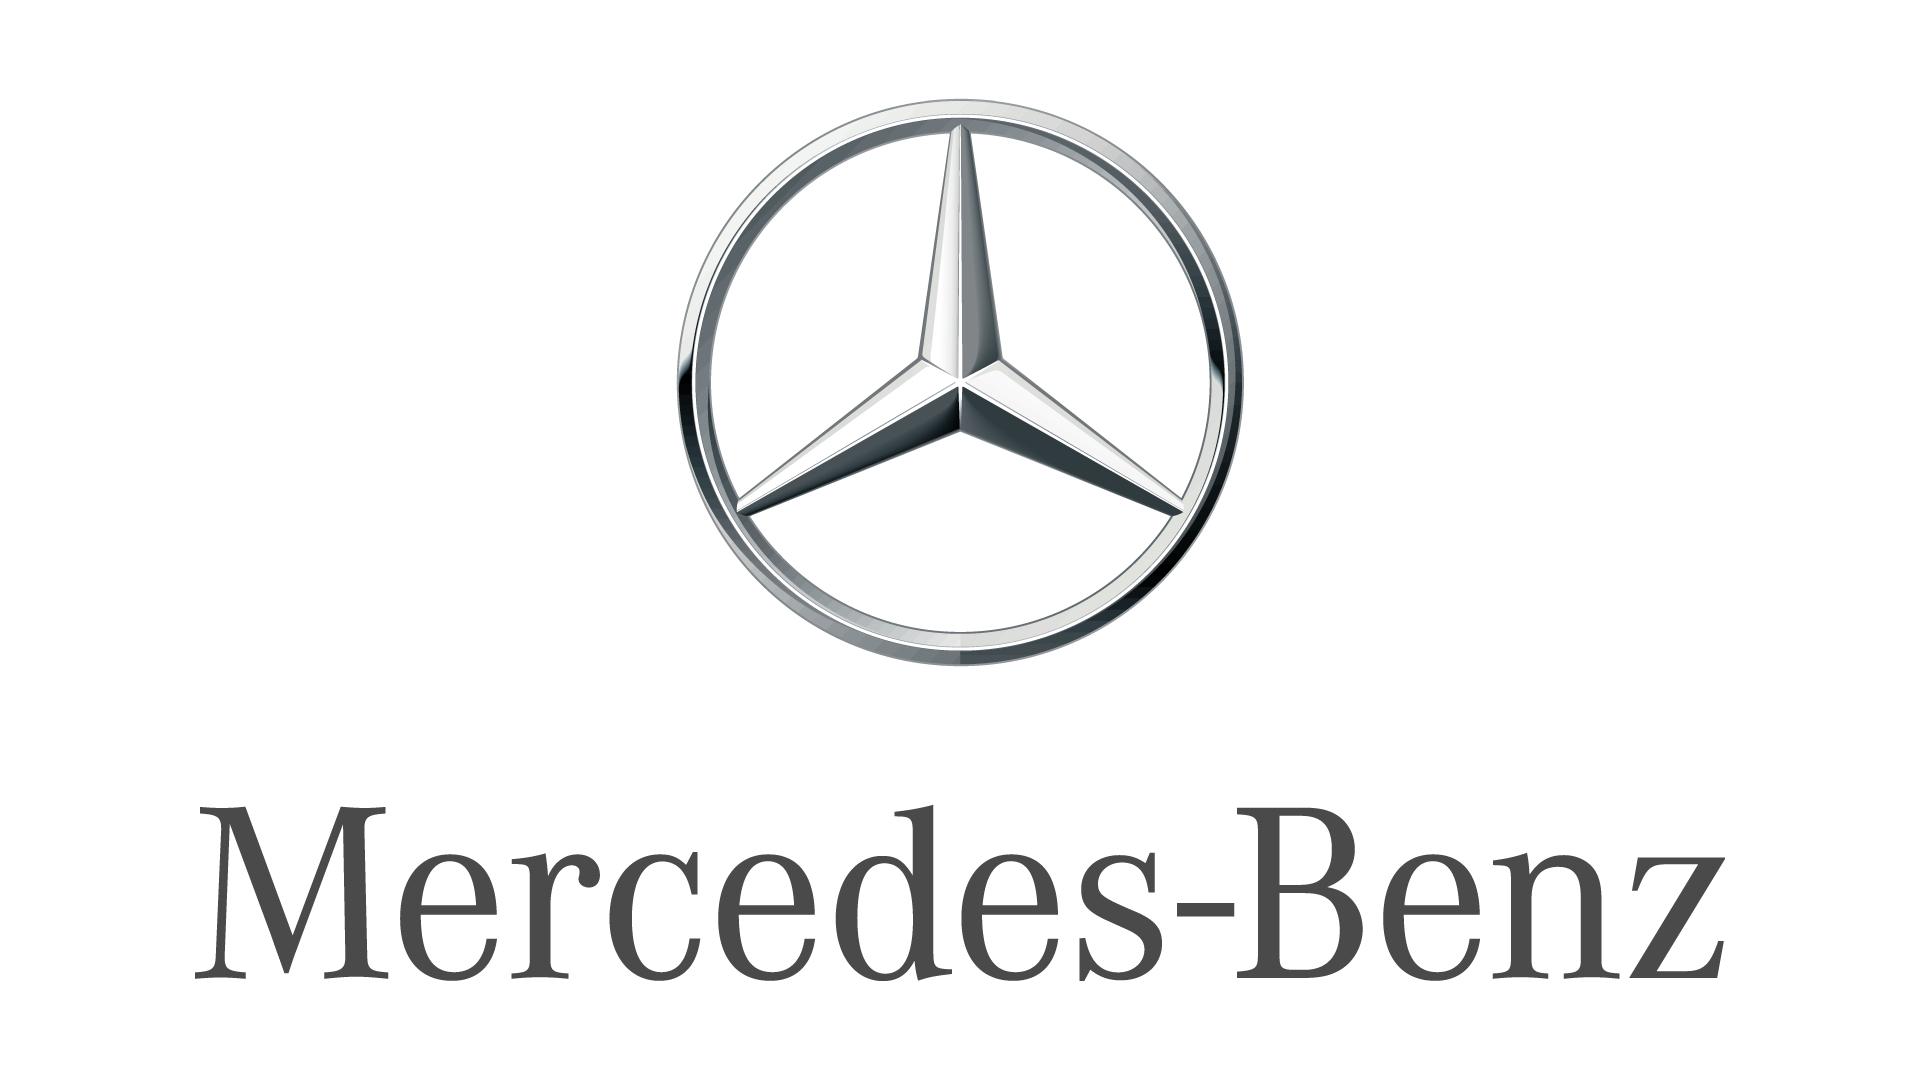 Mercedes-Benz corporate logo